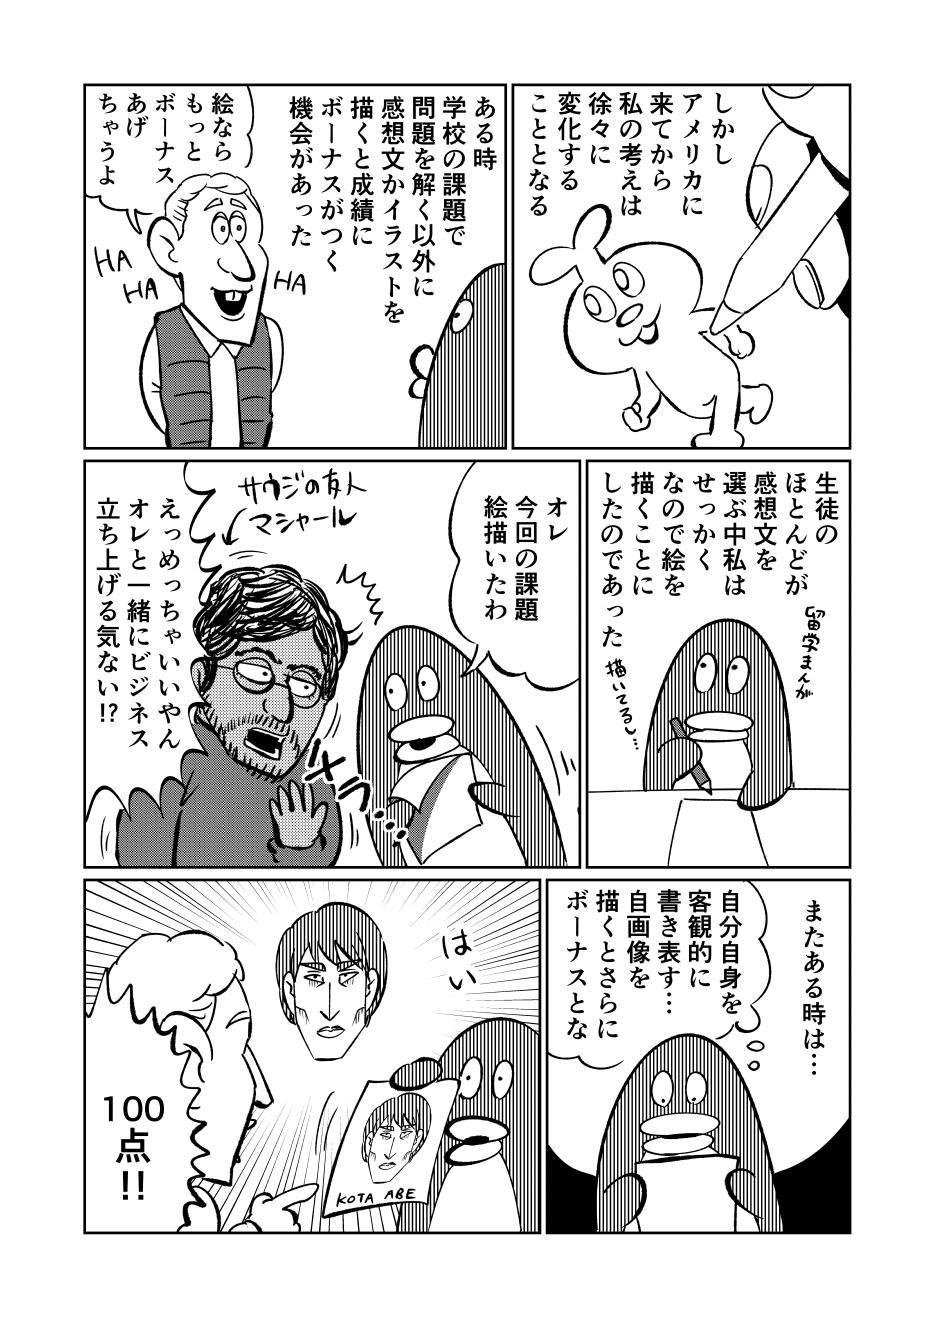 https://www.ryugaku.co.jp/blog/els_portland/upload/0903.jpg